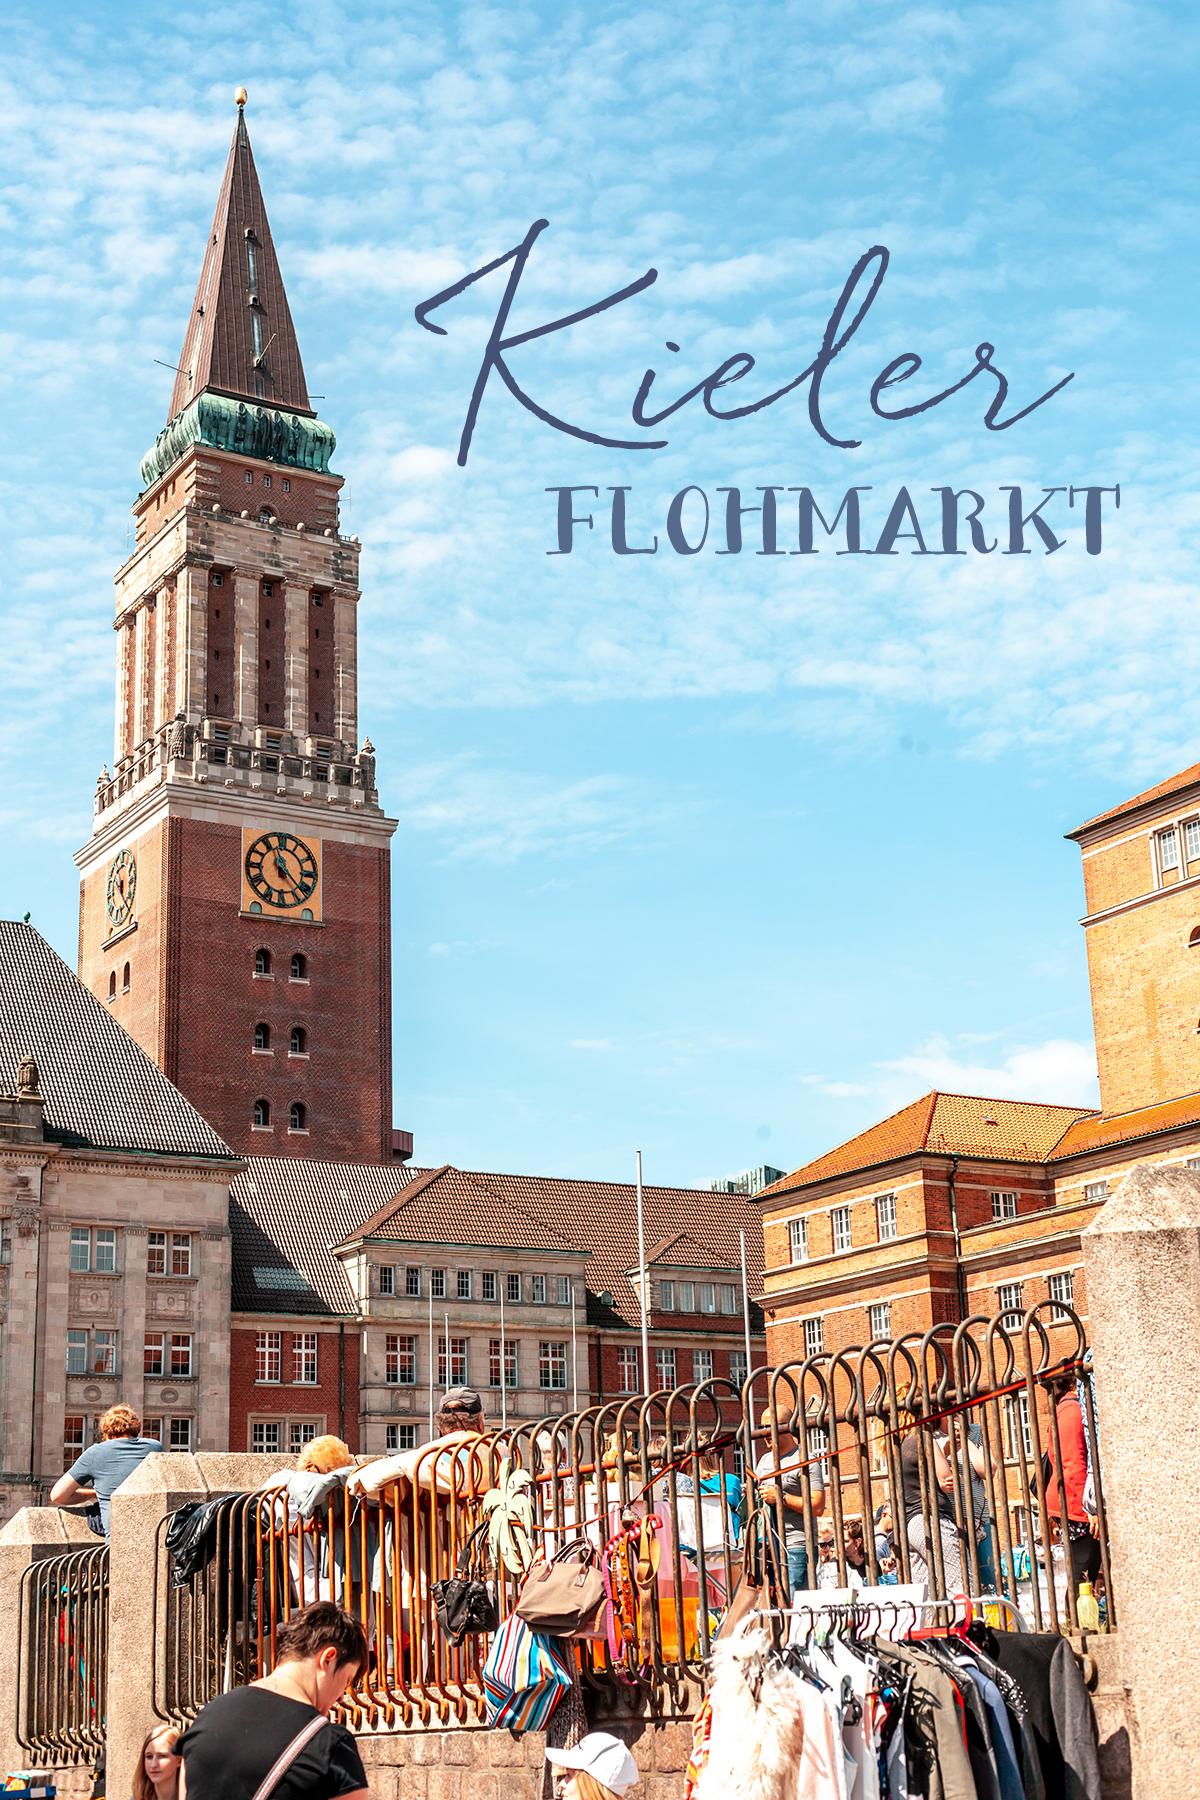 Kieler Innenstadt Flohmarkt